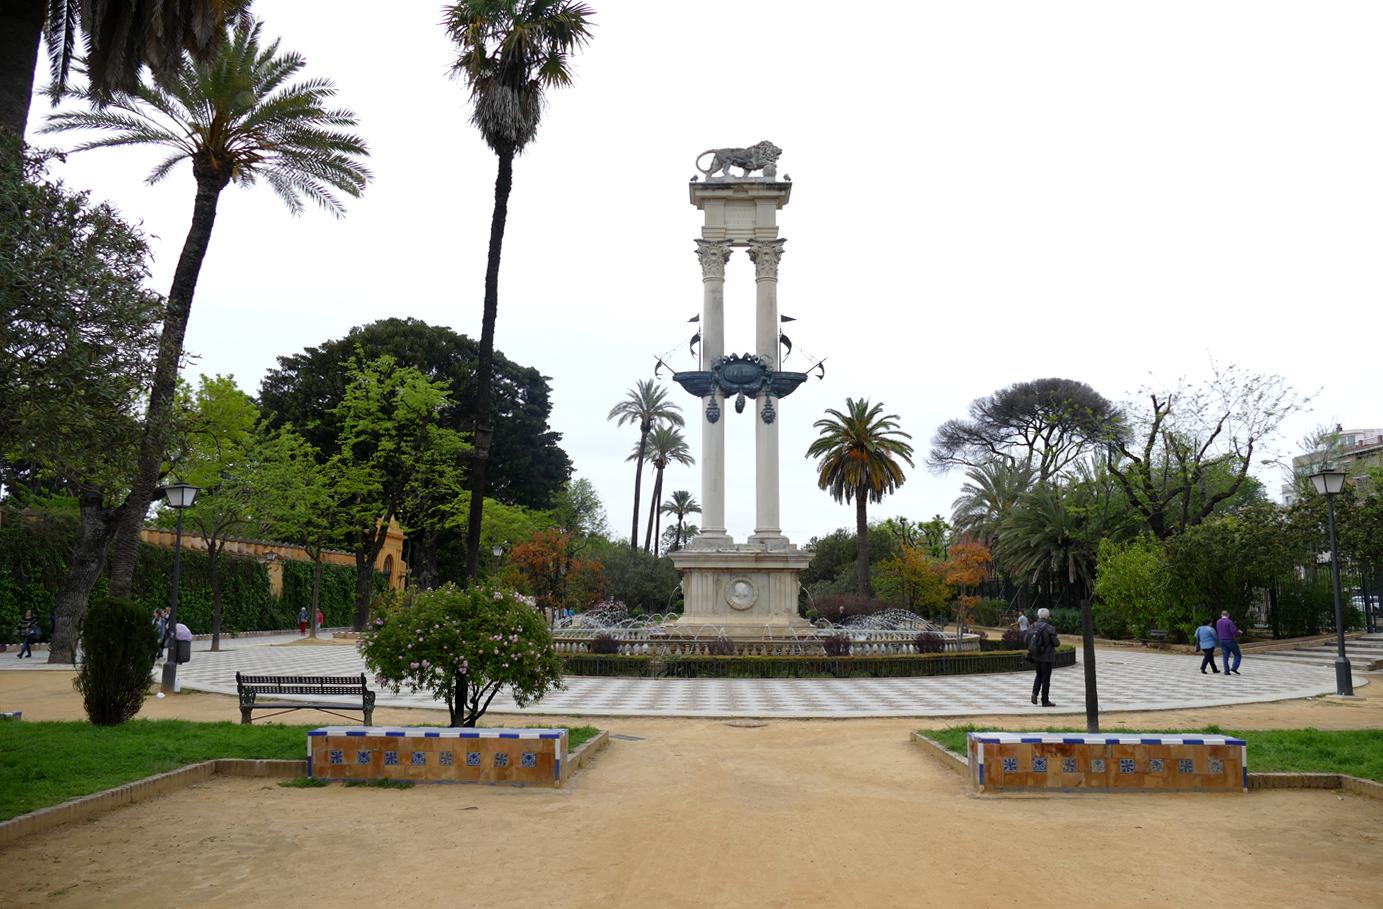 Jardines de murillo sevilla city centre - Jardines verticales sevilla ...